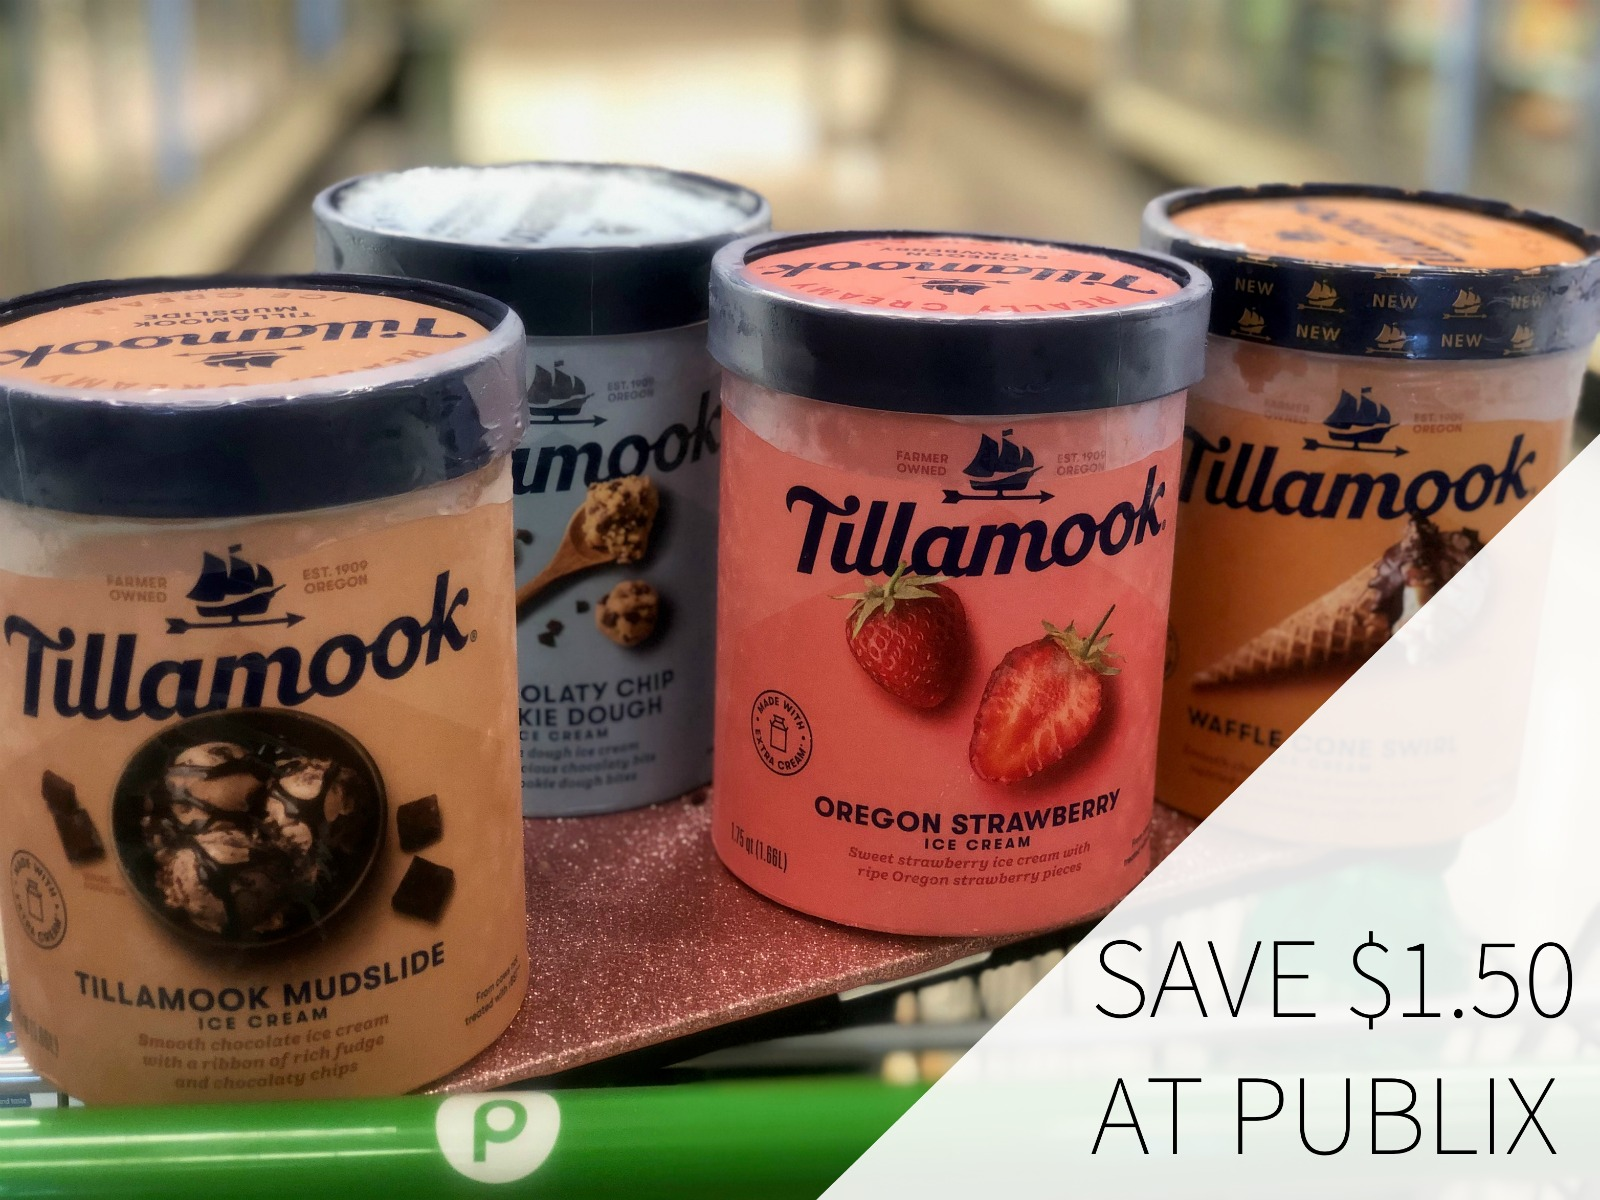 Enjoy The Rich, Creamy Taste Of Tillamook Ice Cream & Save $1.50 At Publix on I Heart Publix